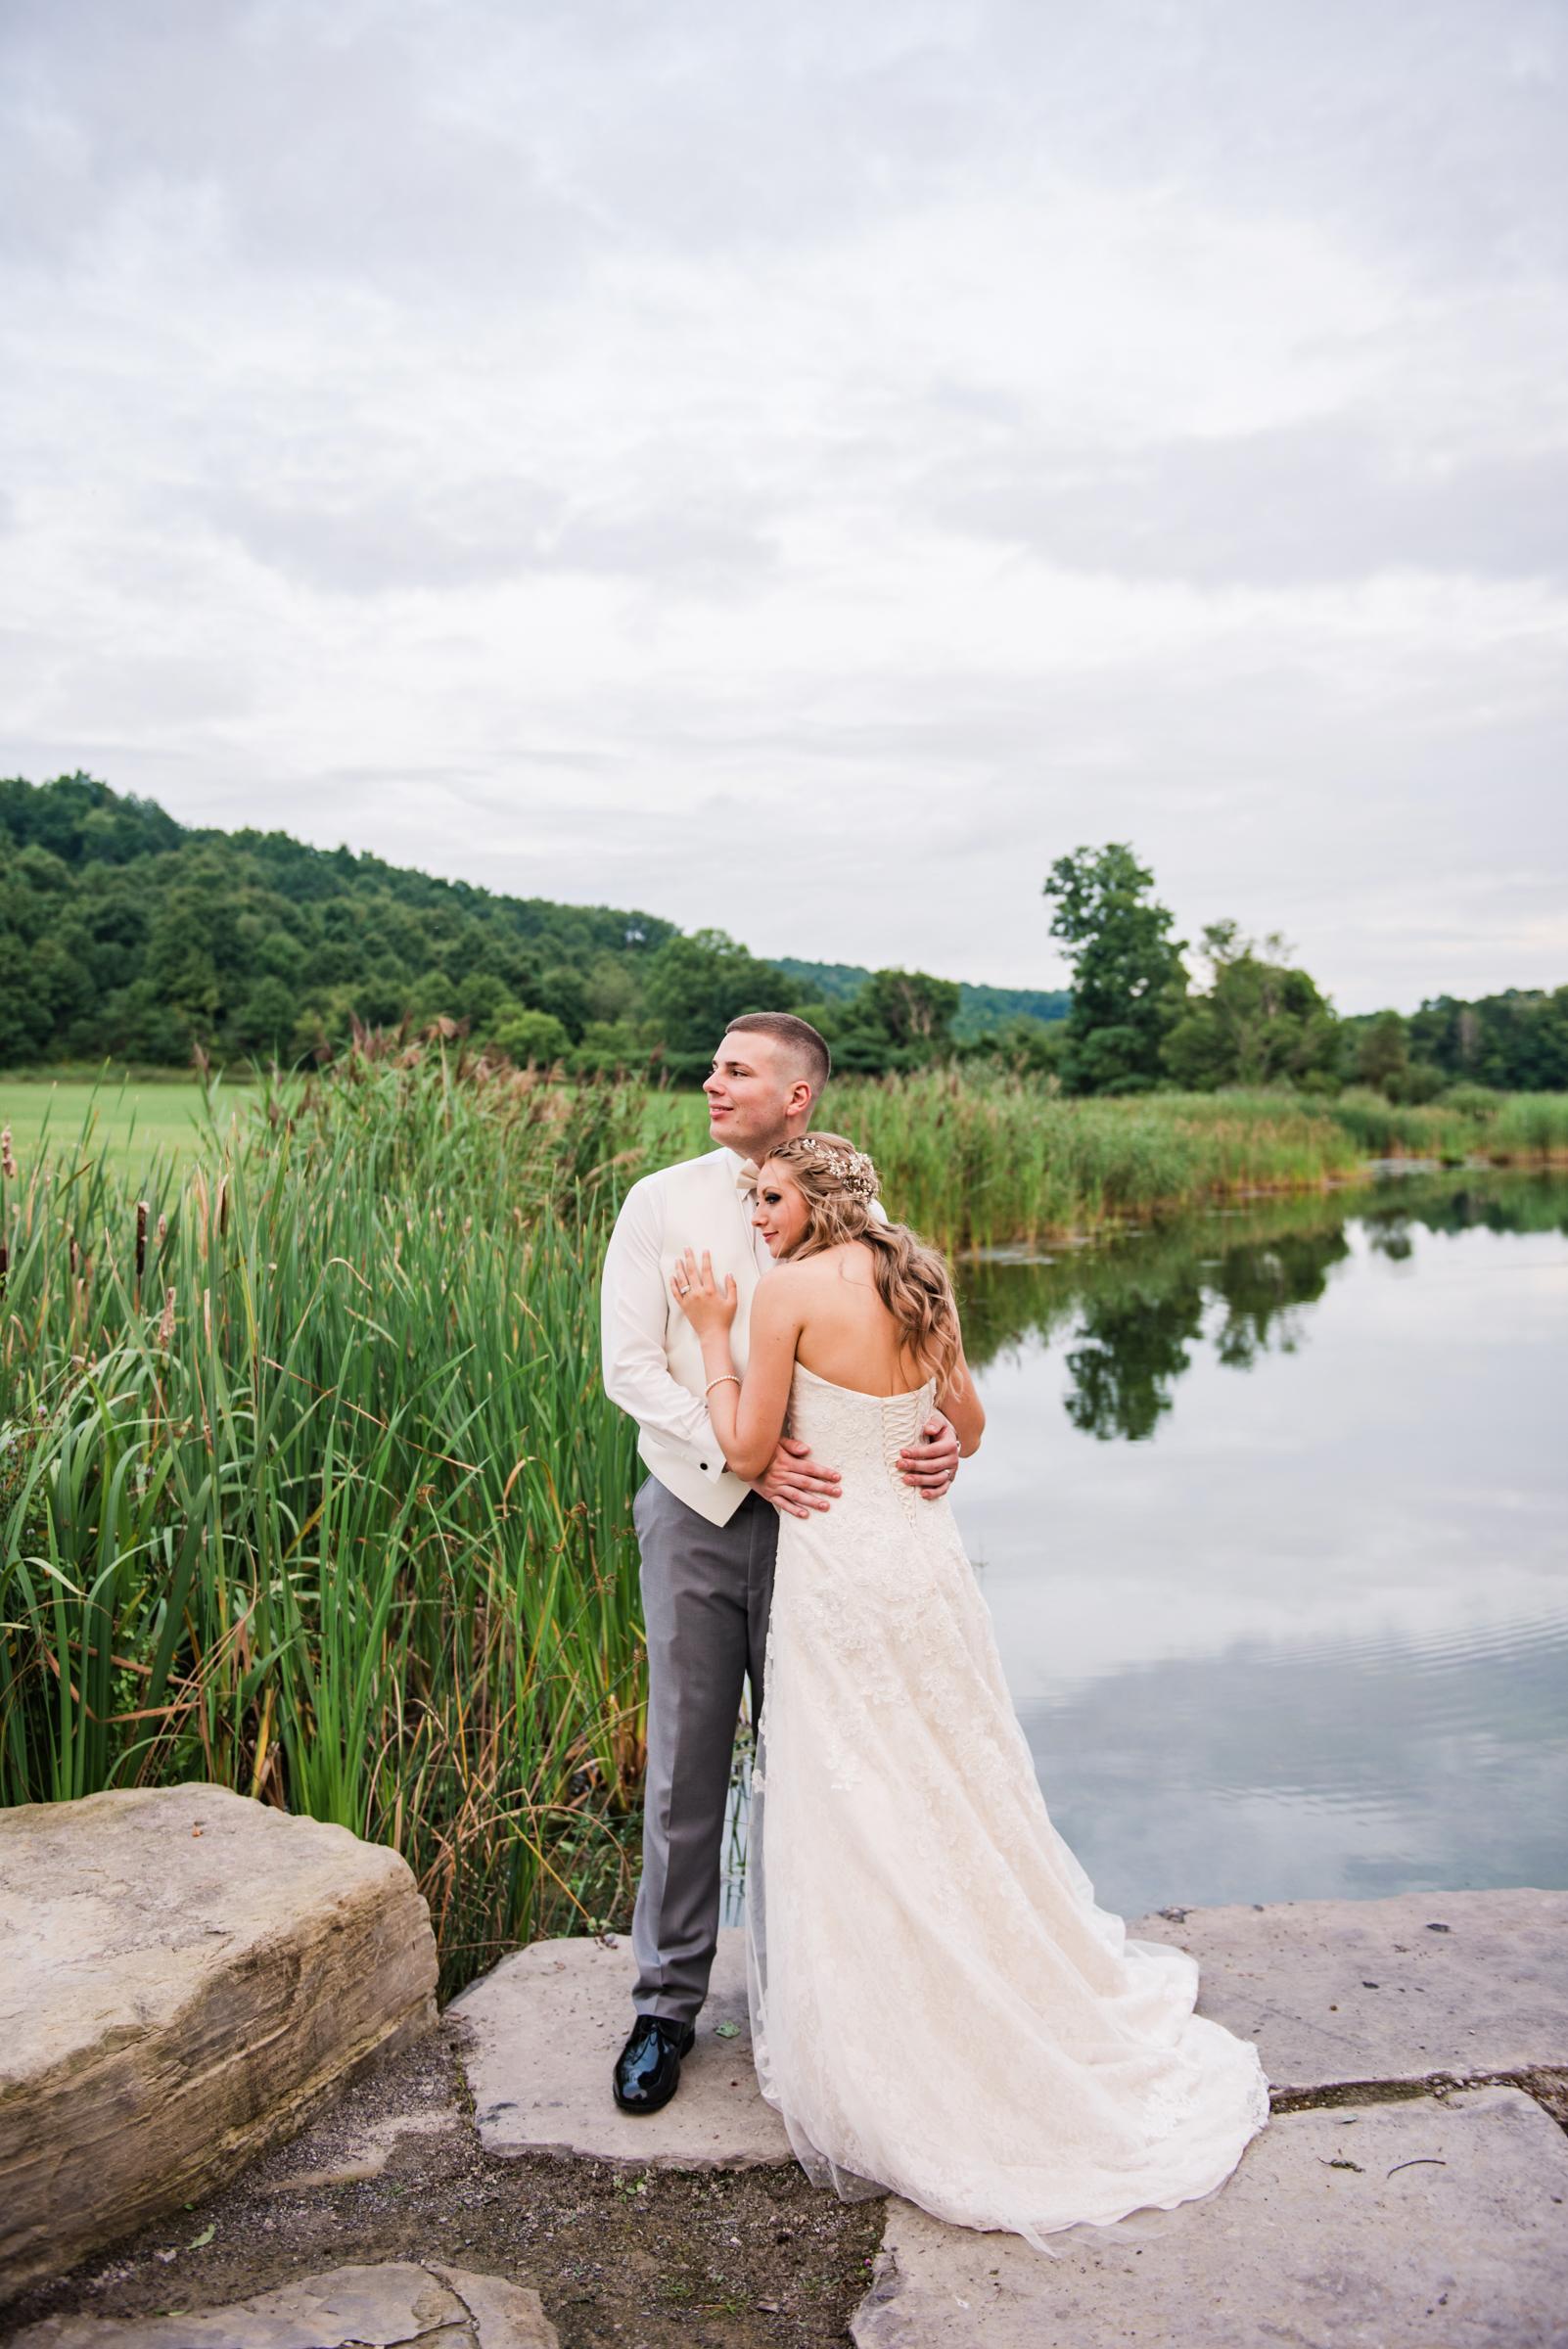 Wolf_Oak_Acres_Central_NY_Wedding_JILL_STUDIO_Rochester_NY_Photographer_DSC_8985.jpg